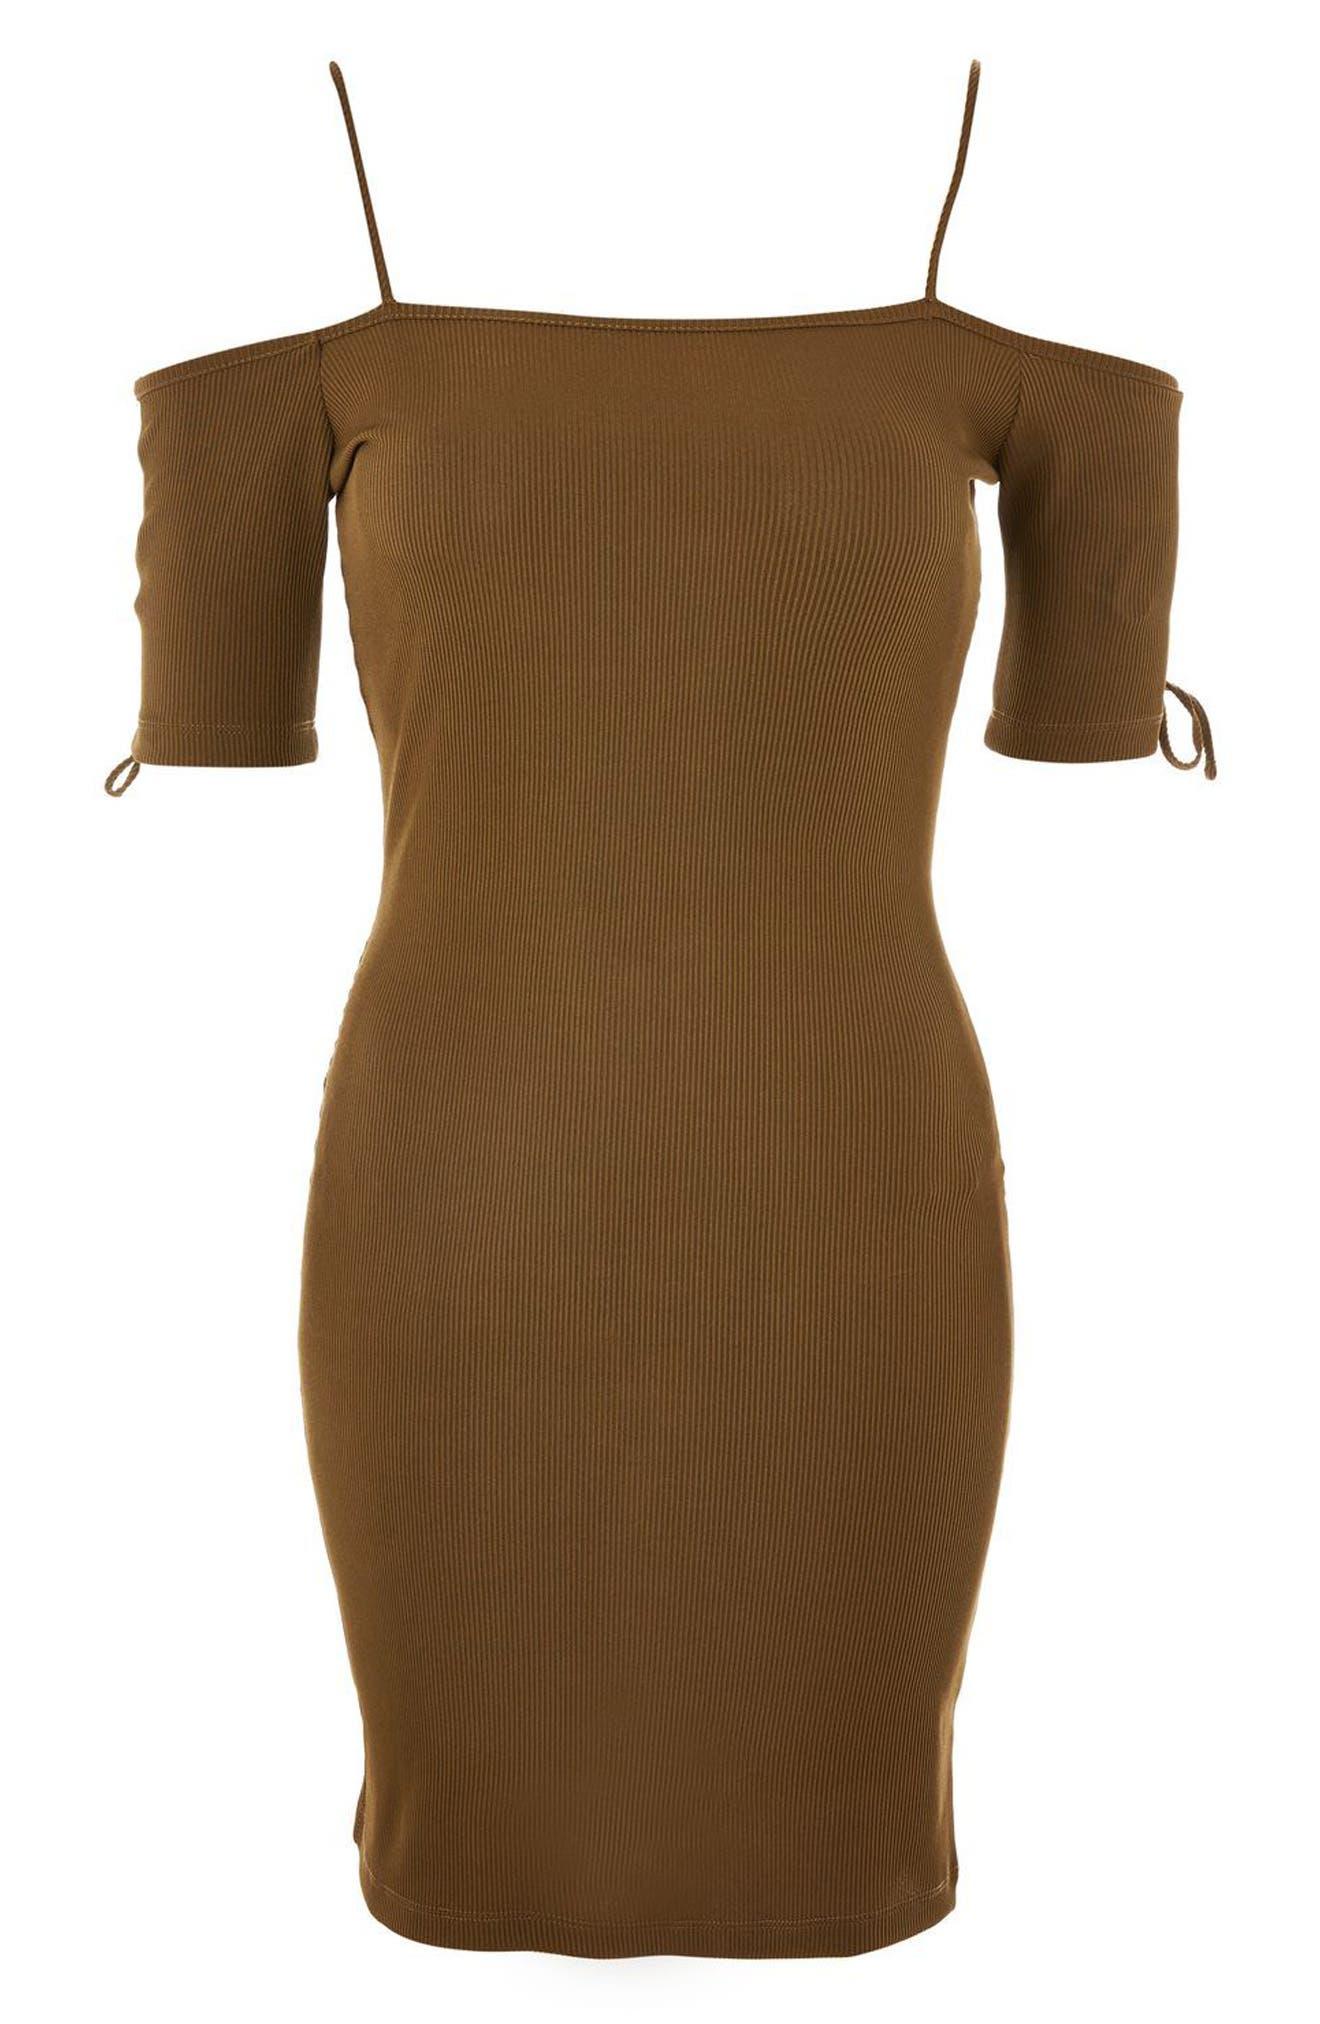 Bardot Lace-Up Sleeve Dress,                             Alternate thumbnail 3, color,                             300